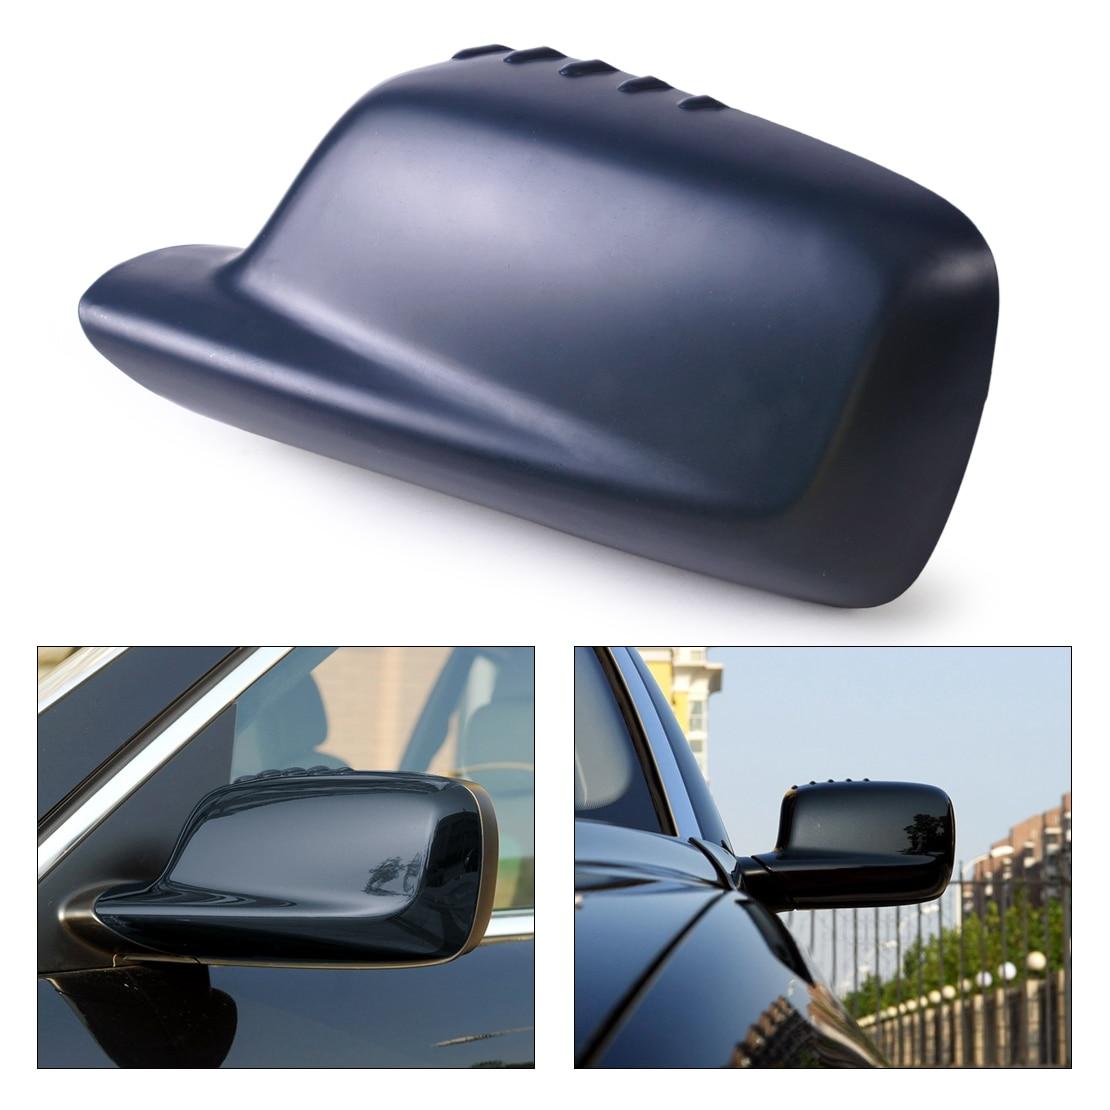 beler New Arrival 1Pc Left Door Mirror Cover Cap Case 51167074235 Fit for BMW E46 E65 E66 330Ci 323Ci 325Ci 745i 750i 750Li 760i metal parking brake gear actuator repair kit for bmw e65 e66 745i 750i 760i li 40teeth